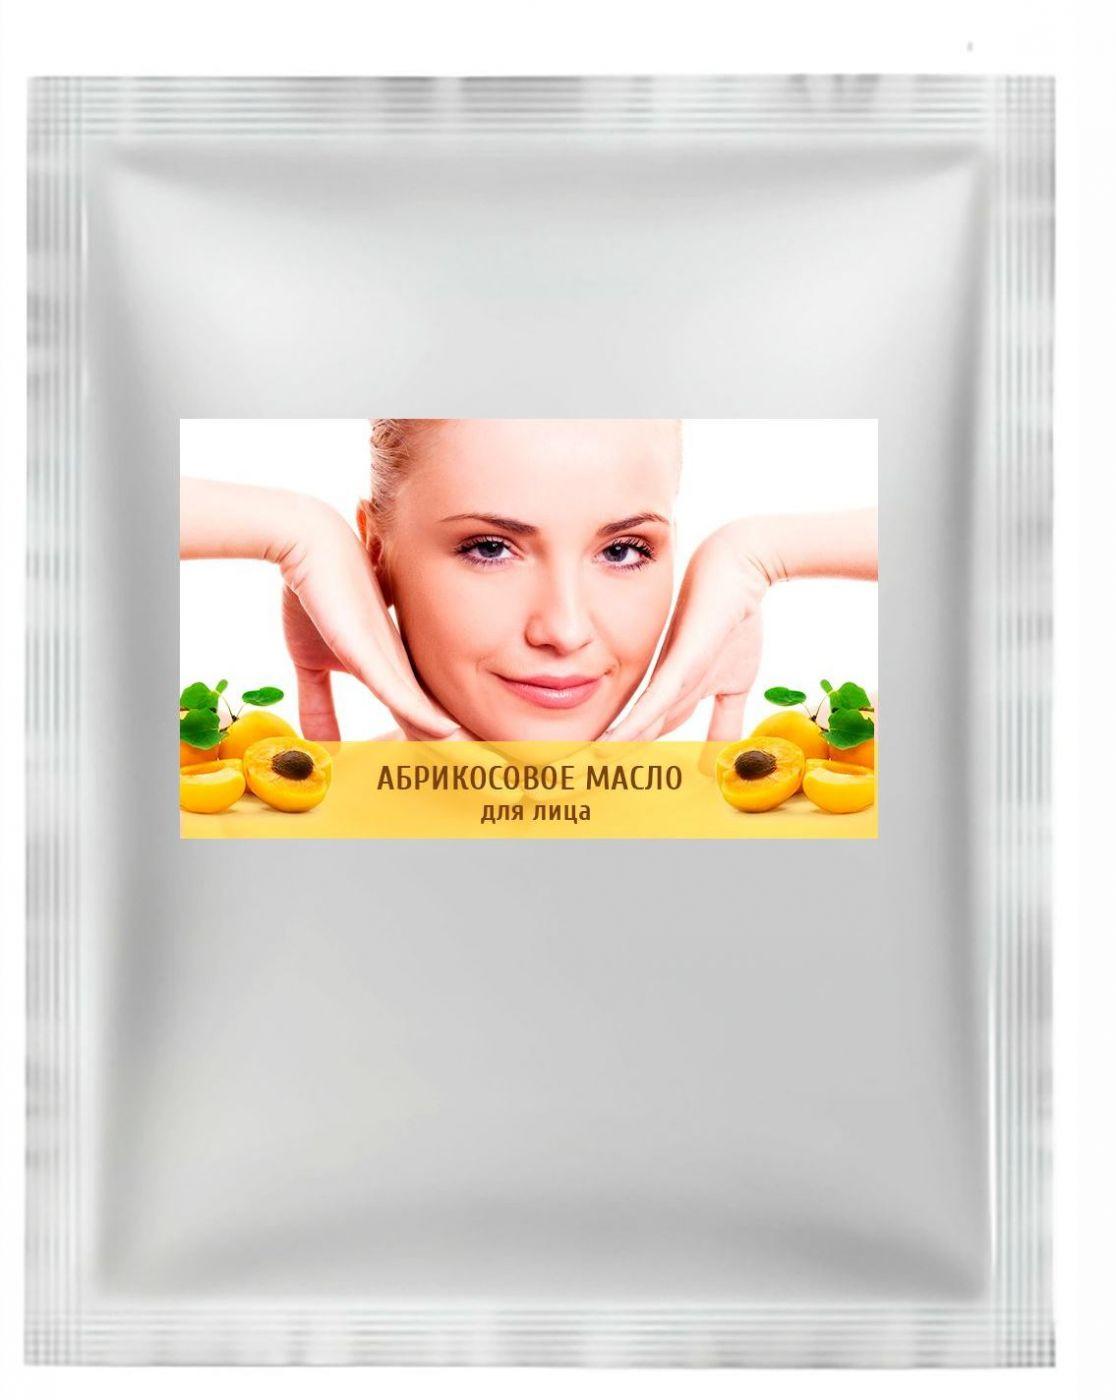 Абрикосовое масло для лица, 10 мл